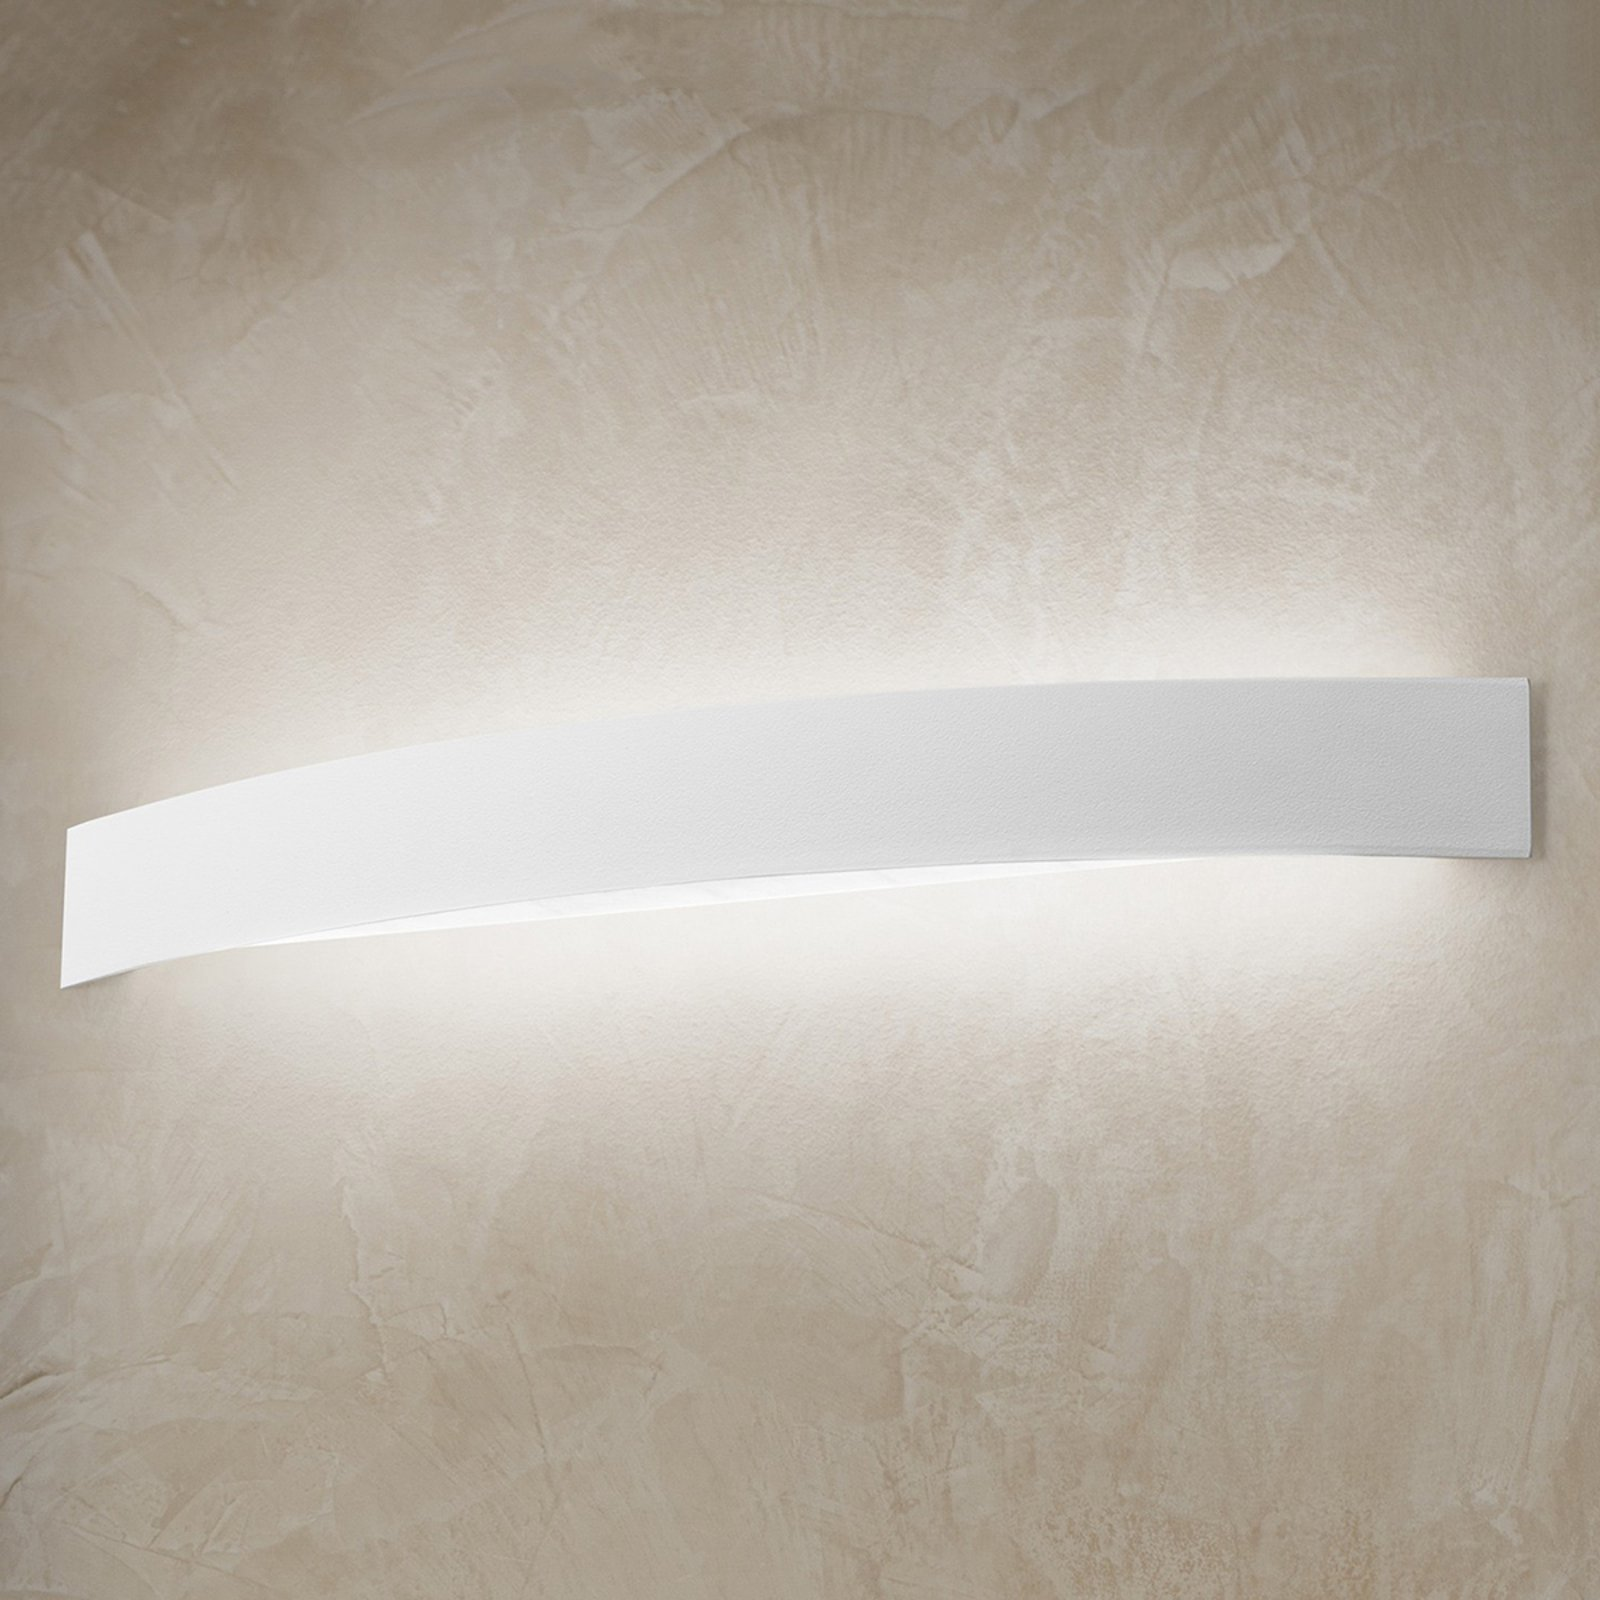 Bueformet LED-vegglampe Curve i hvitt